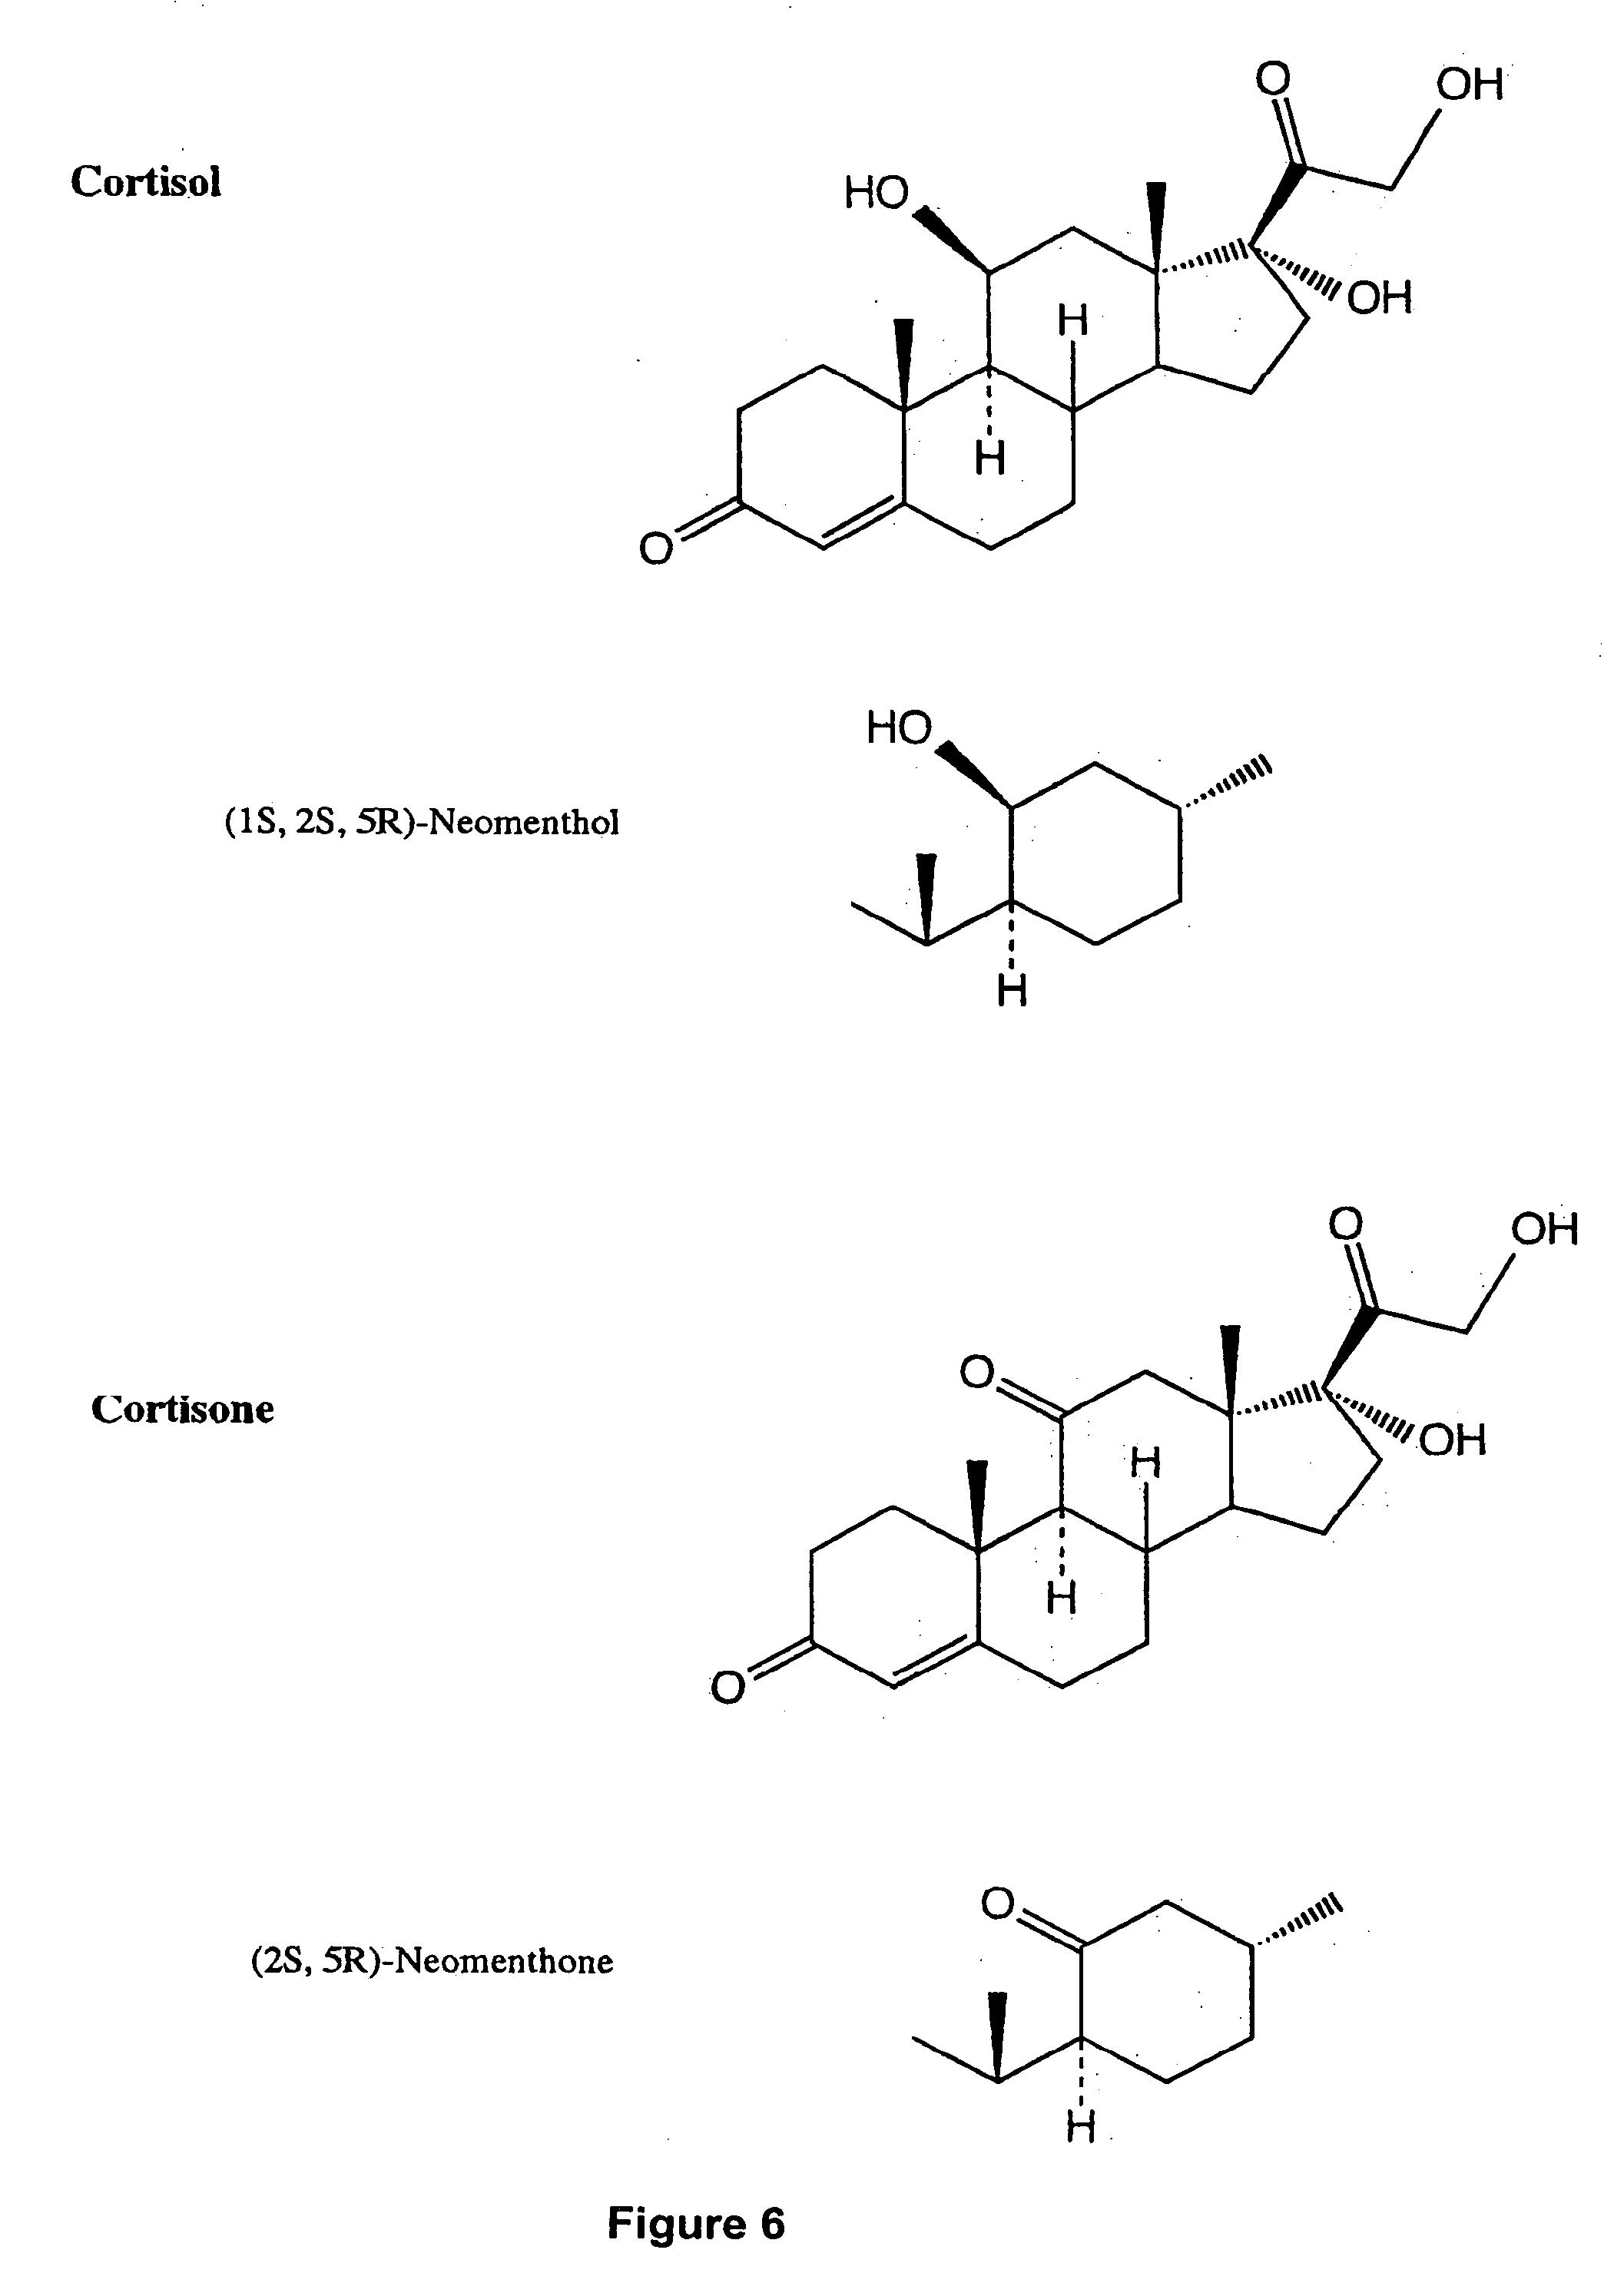 11beta hydroxysteroid dehydrogenase type 2